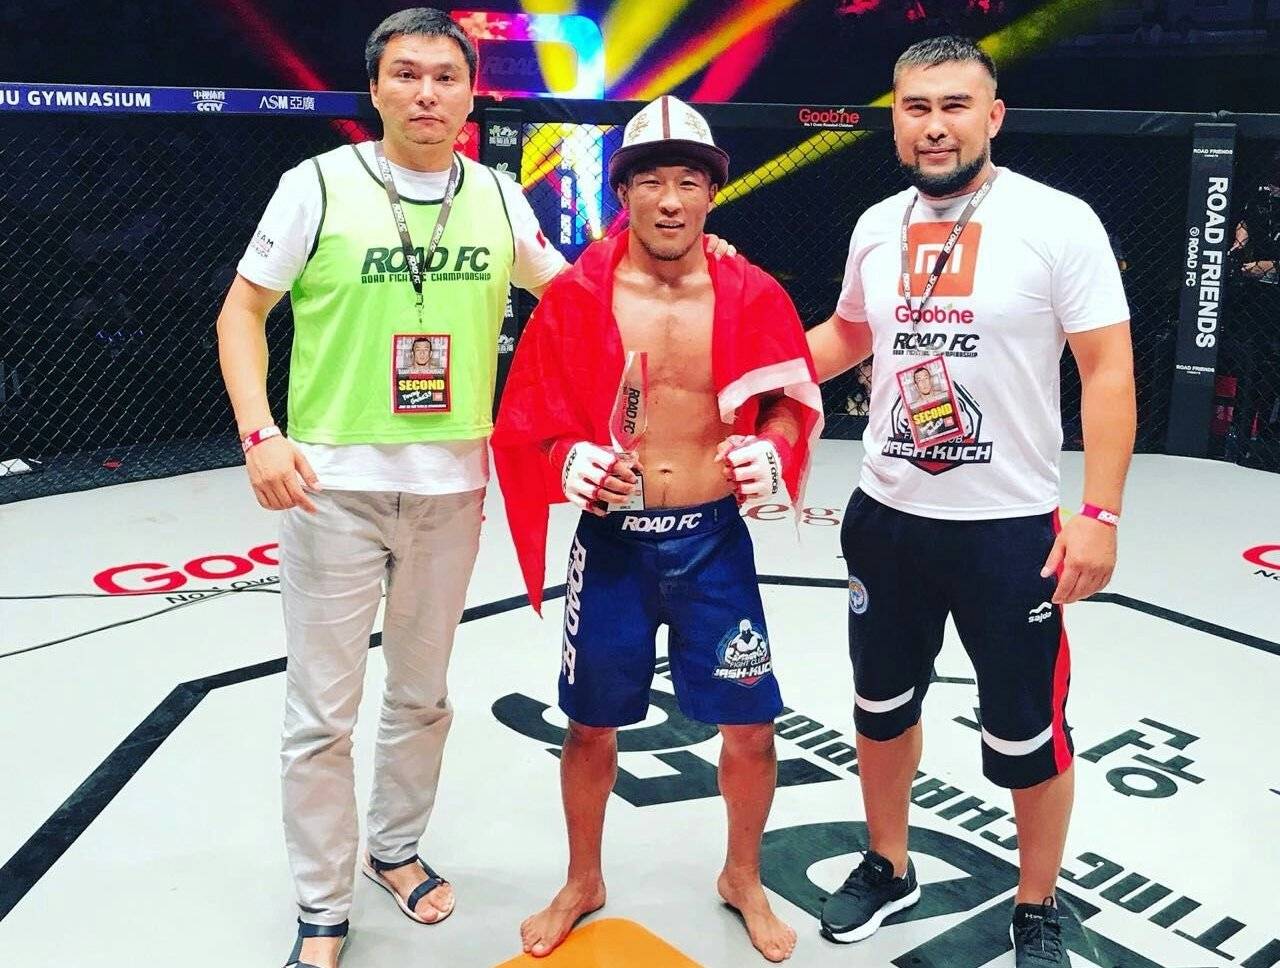 Кыргызстанский боец Бахтияр Тойчубаев победителем турнира Road FC в Корее